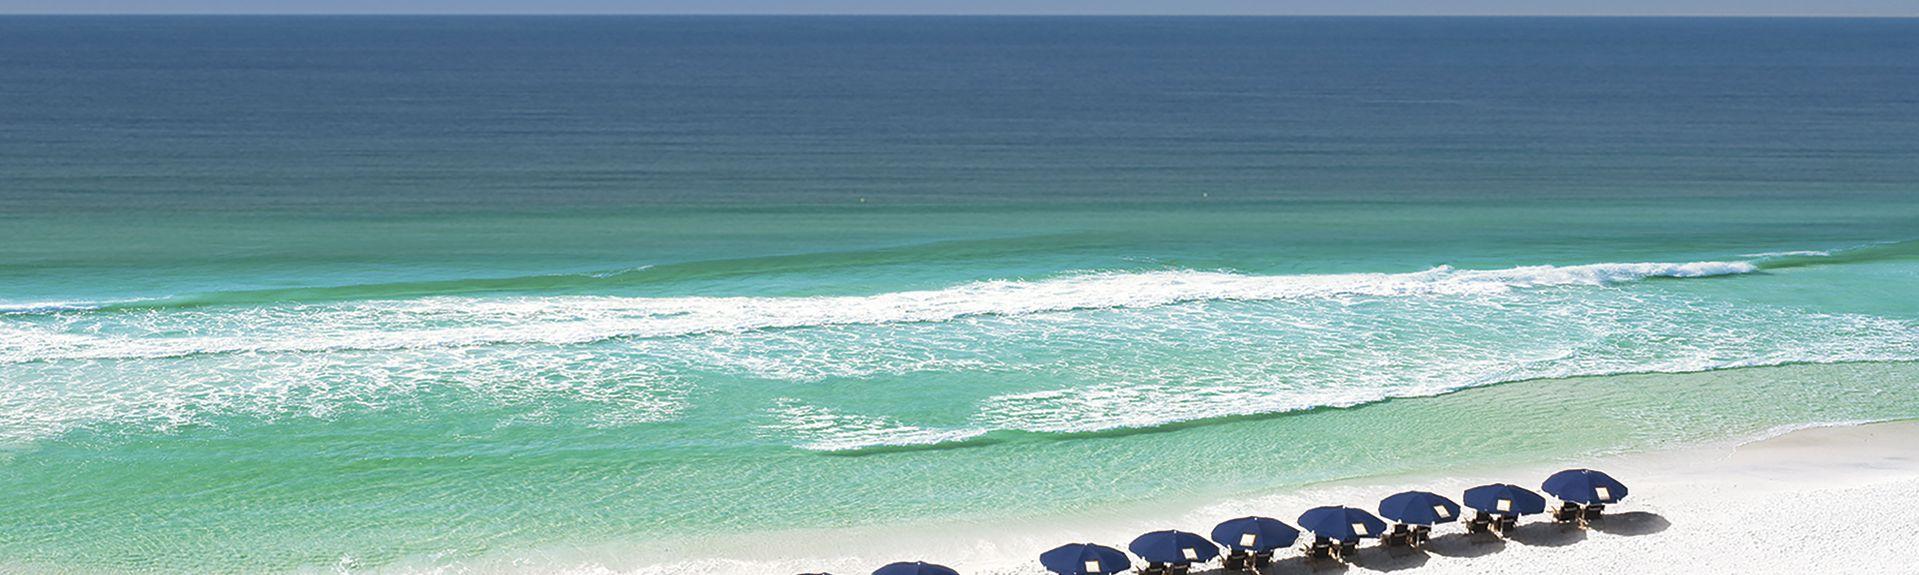 Lasata (Miramar Beach, Floride, États-Unis d'Amérique)